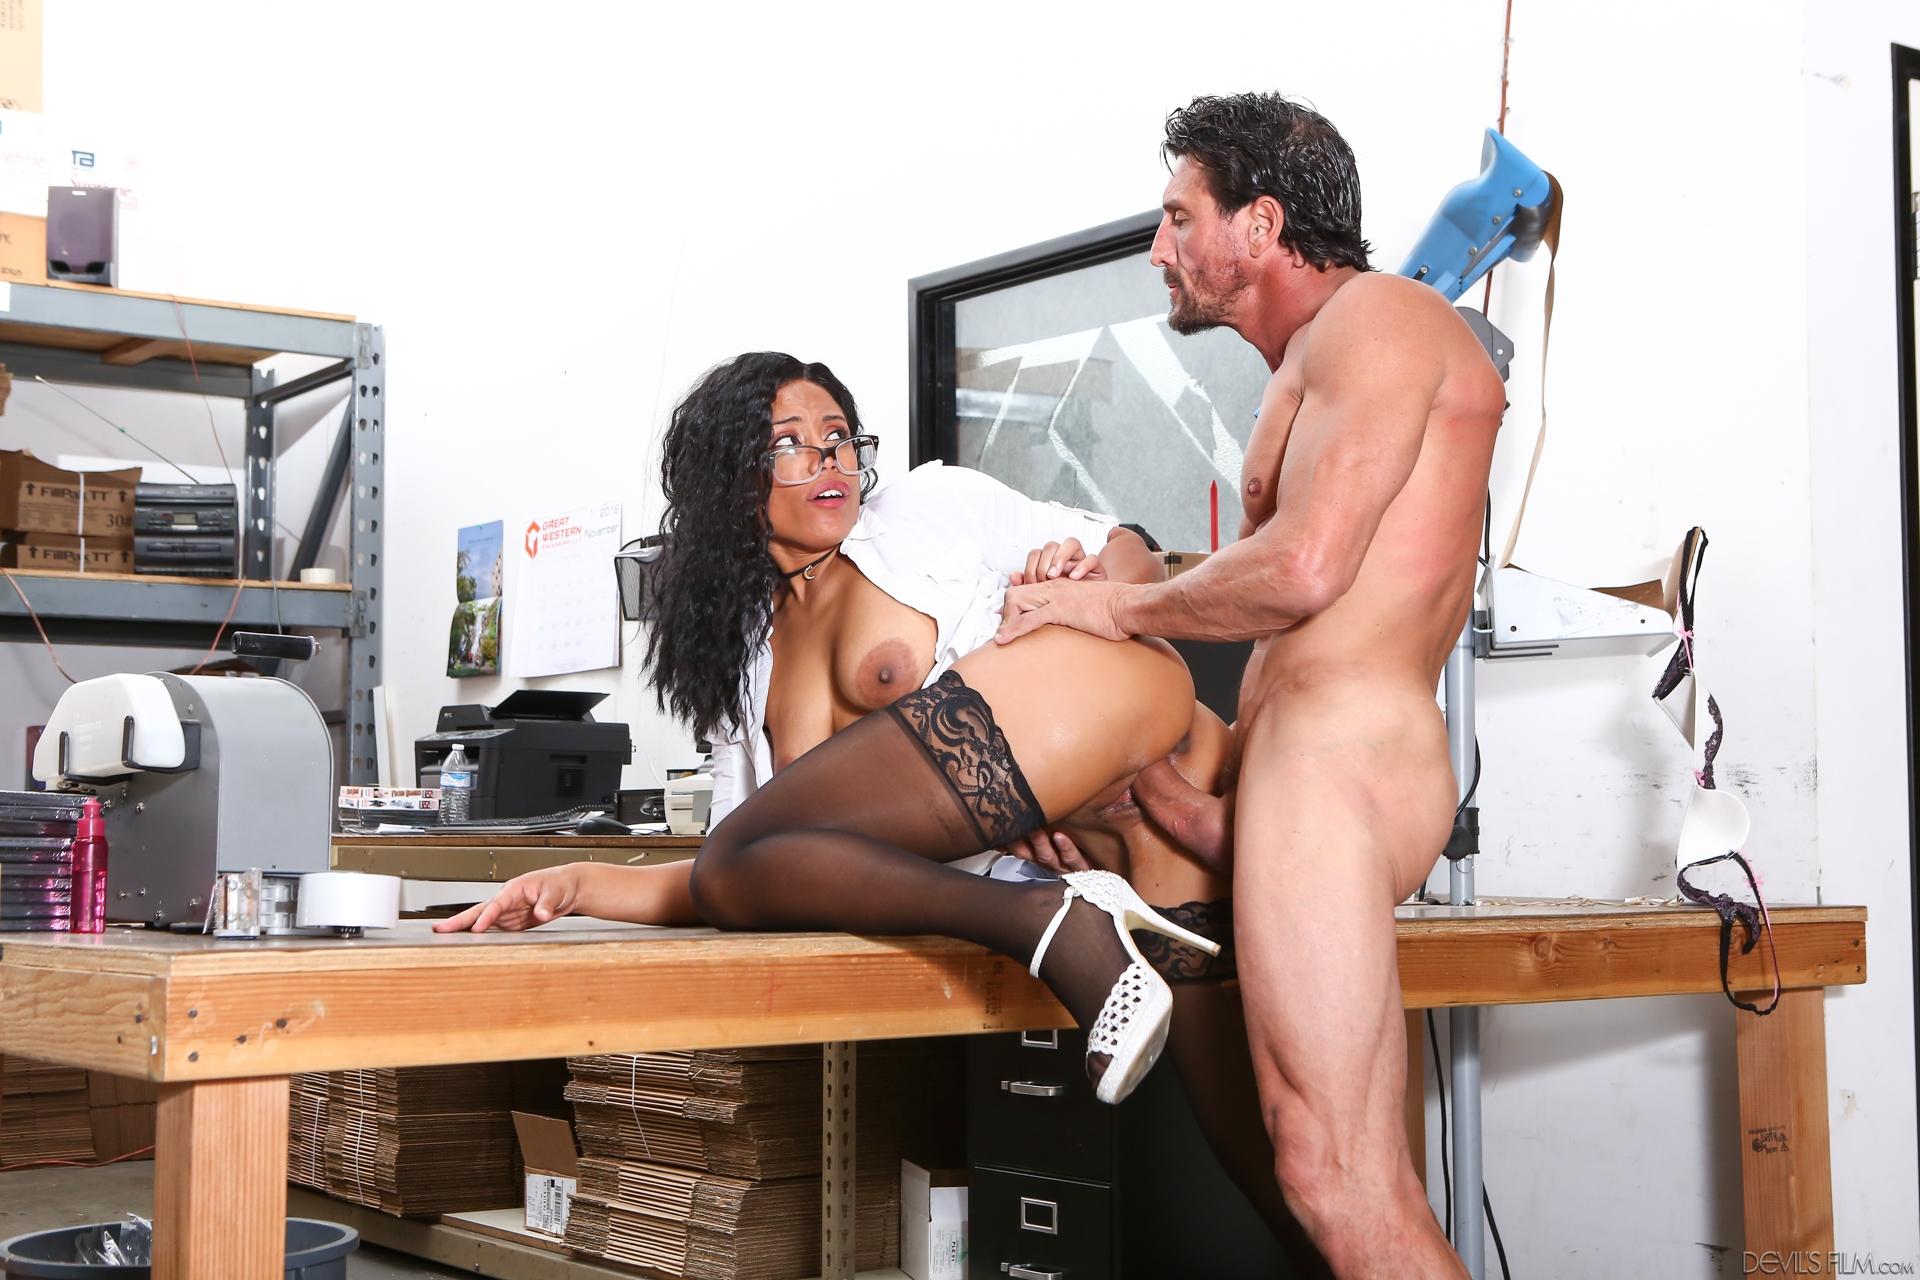 Big tits at the office 4